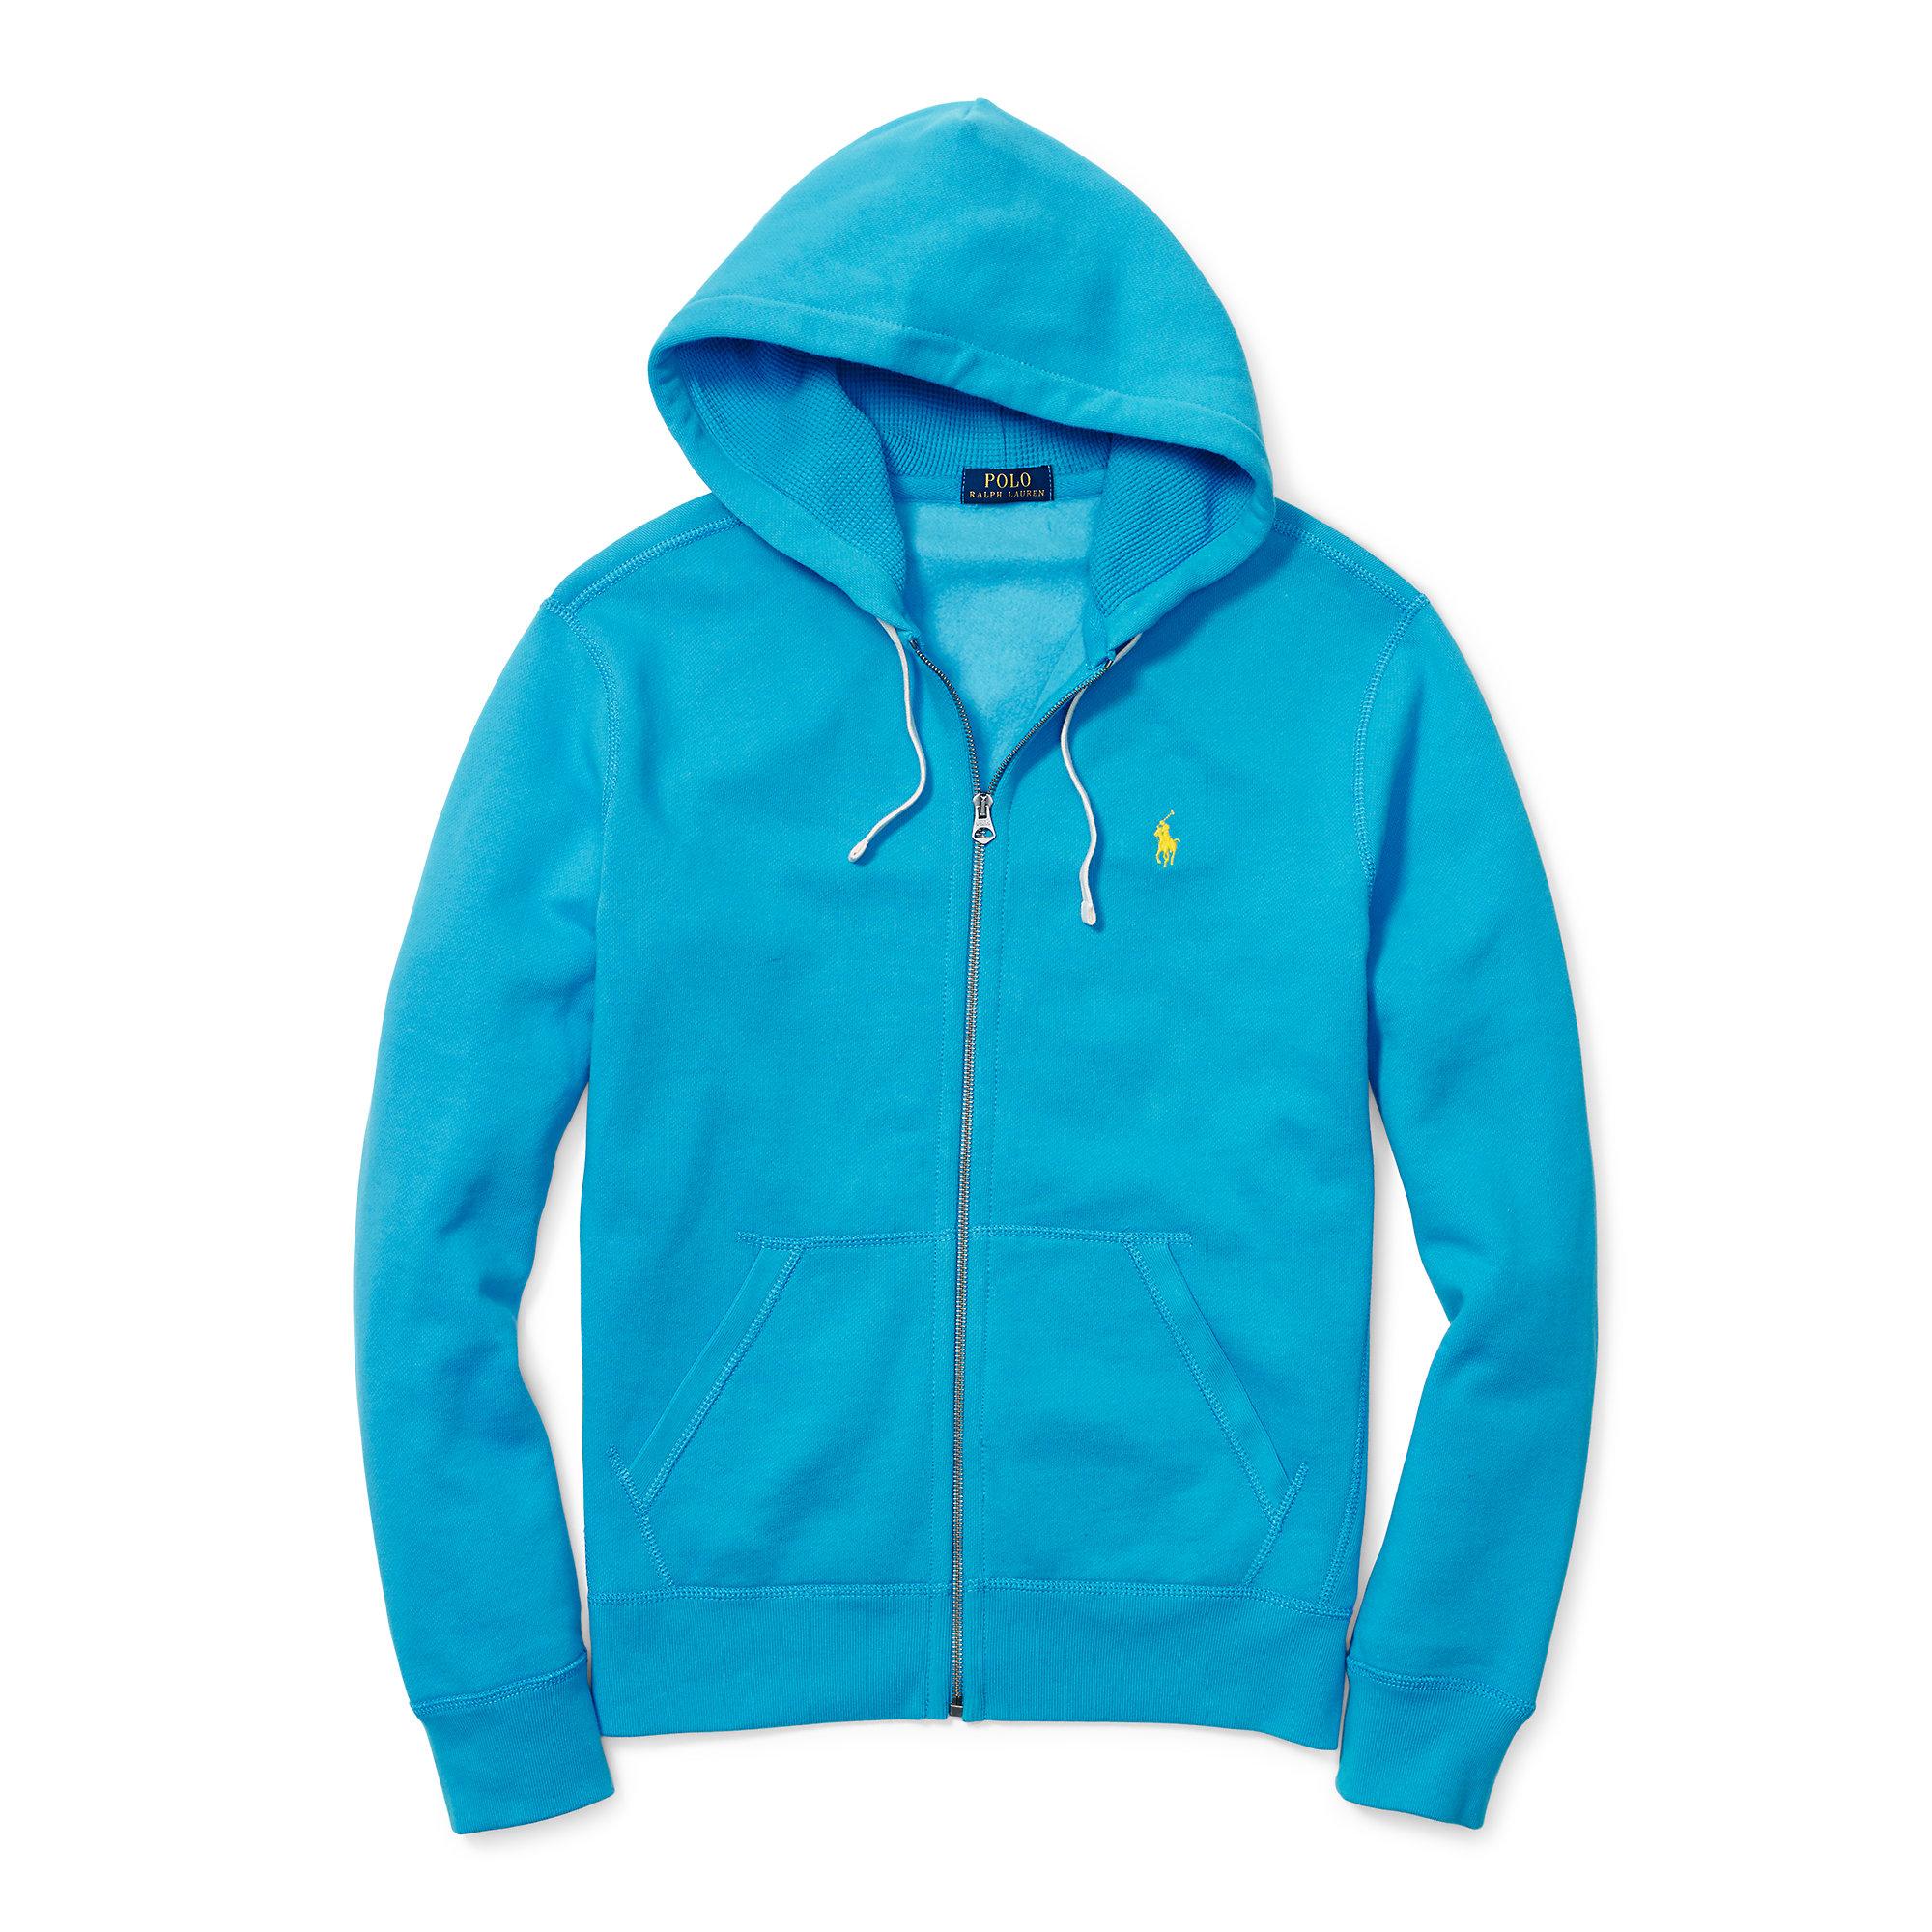 polo ralph lauren cotton blend fleece hoodie in blue for. Black Bedroom Furniture Sets. Home Design Ideas